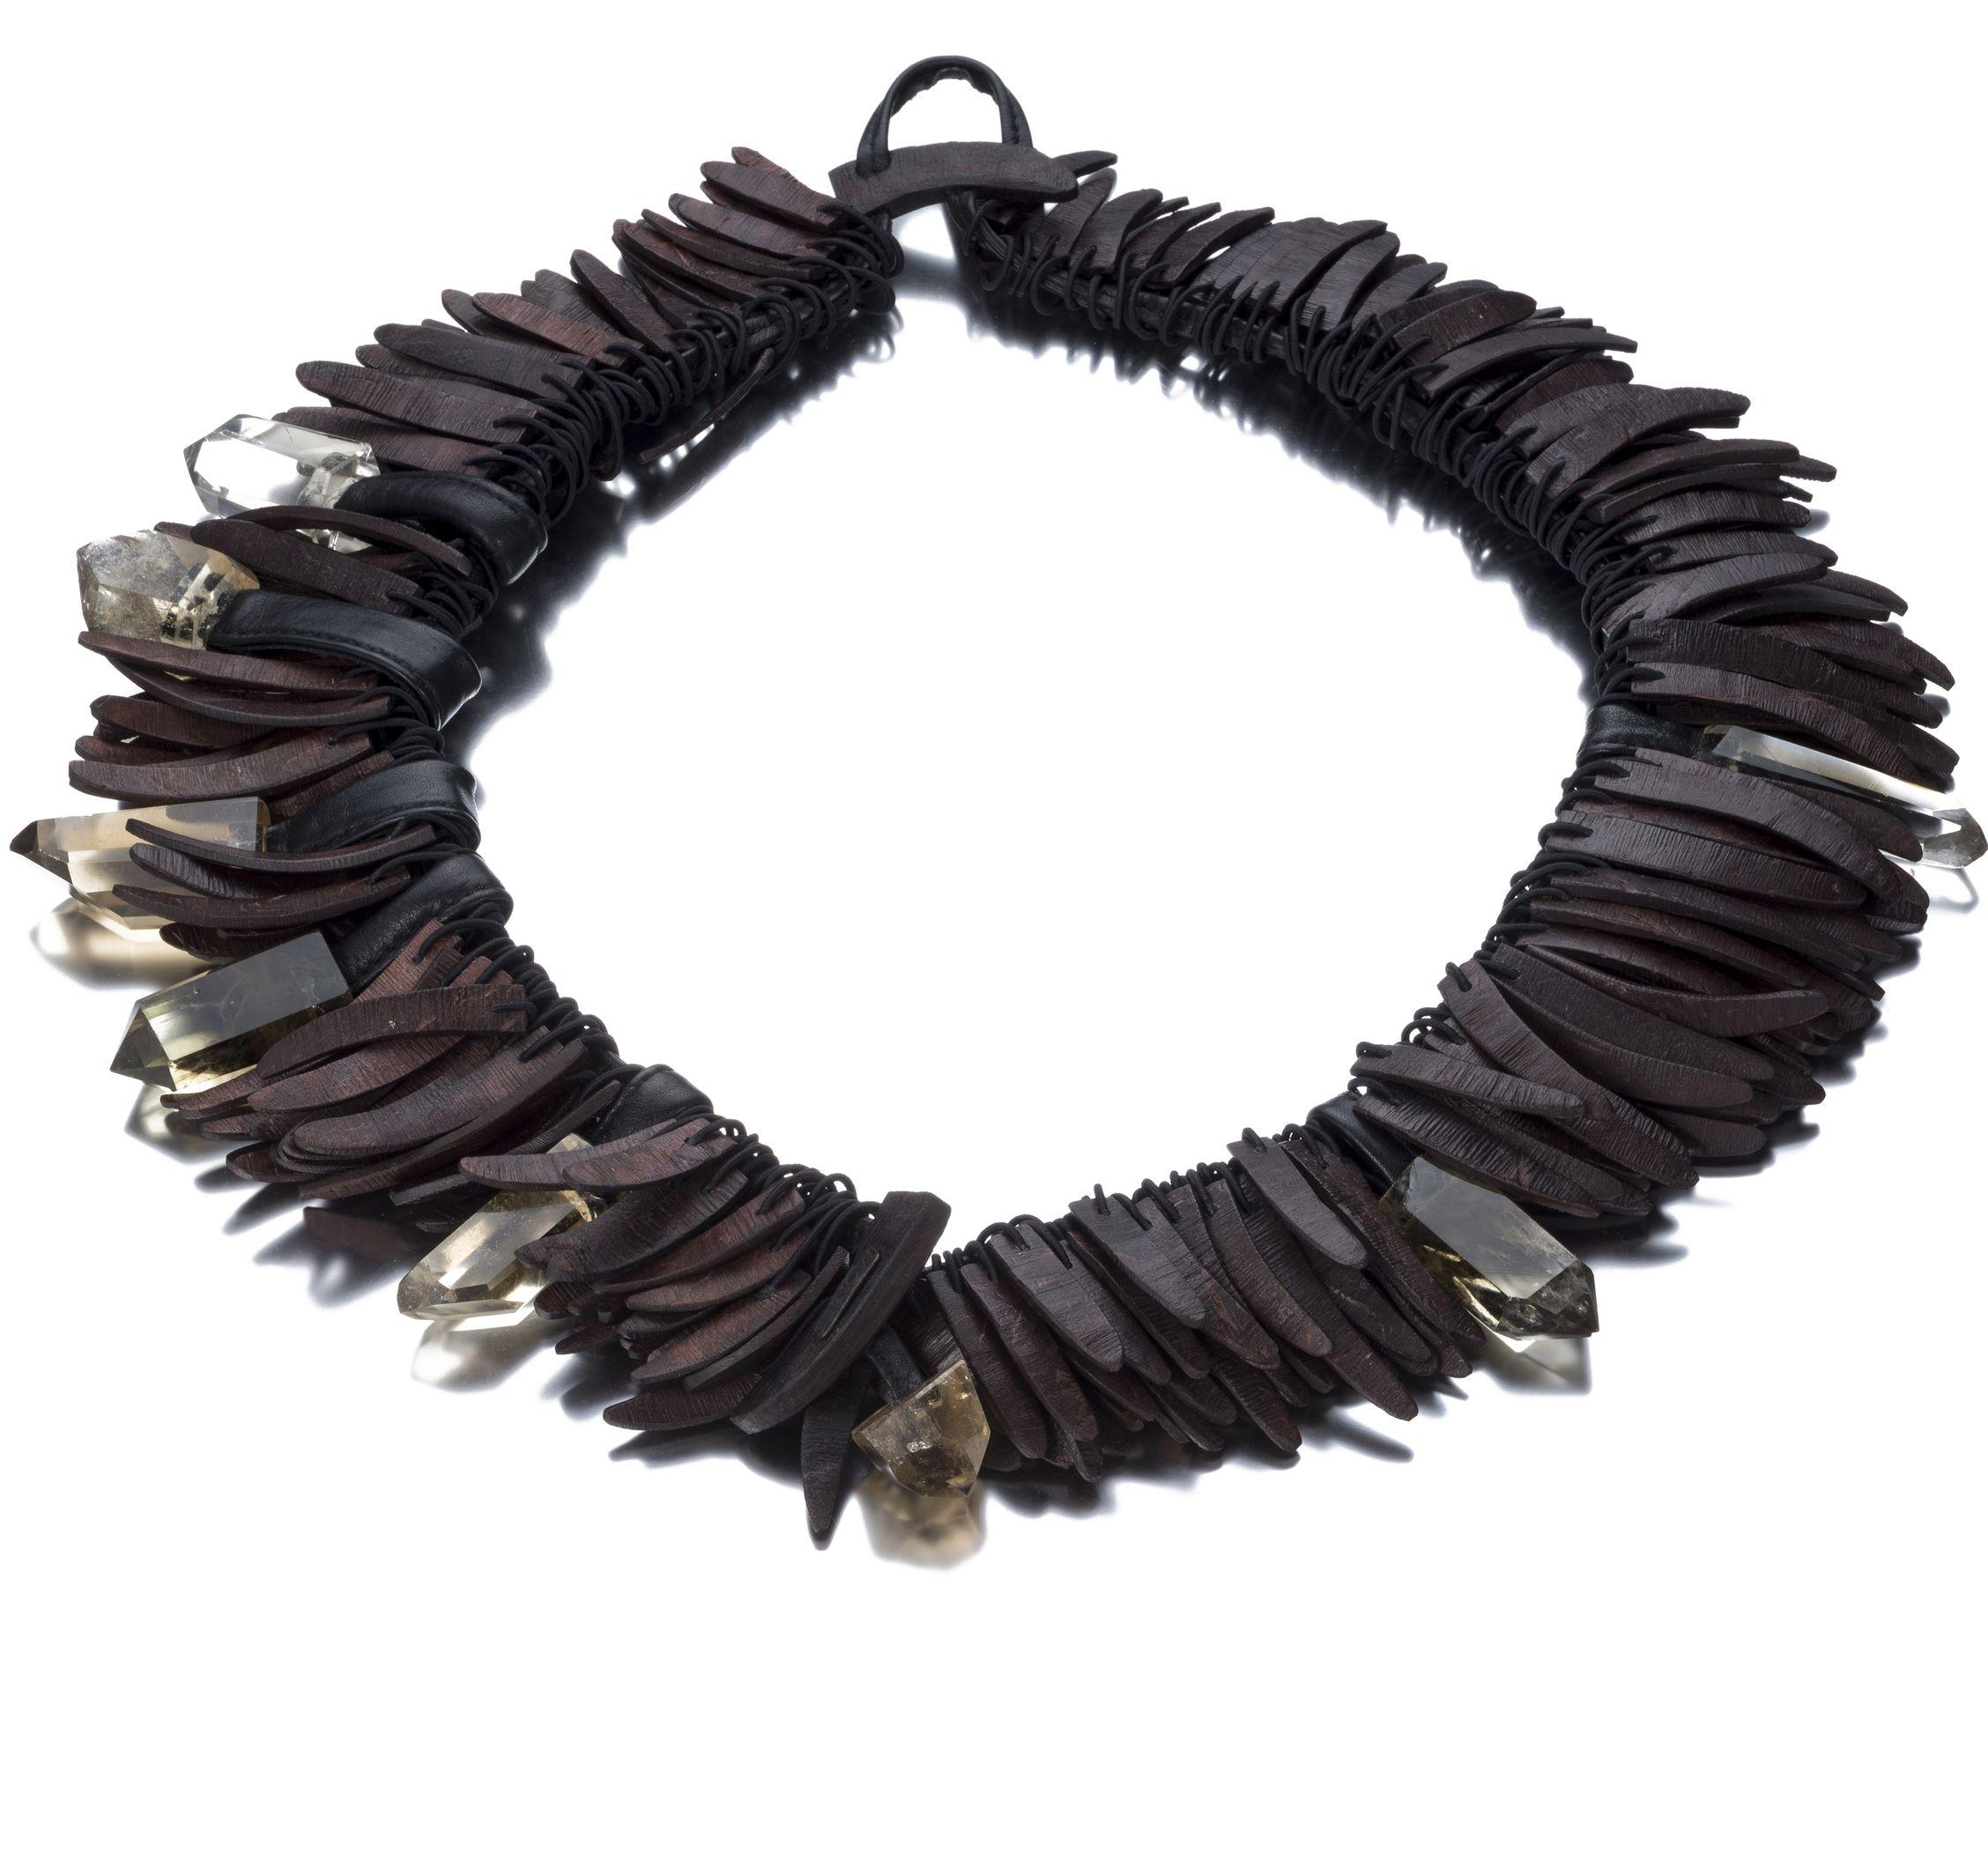 Monies Unique necklace - Black Yl0nm